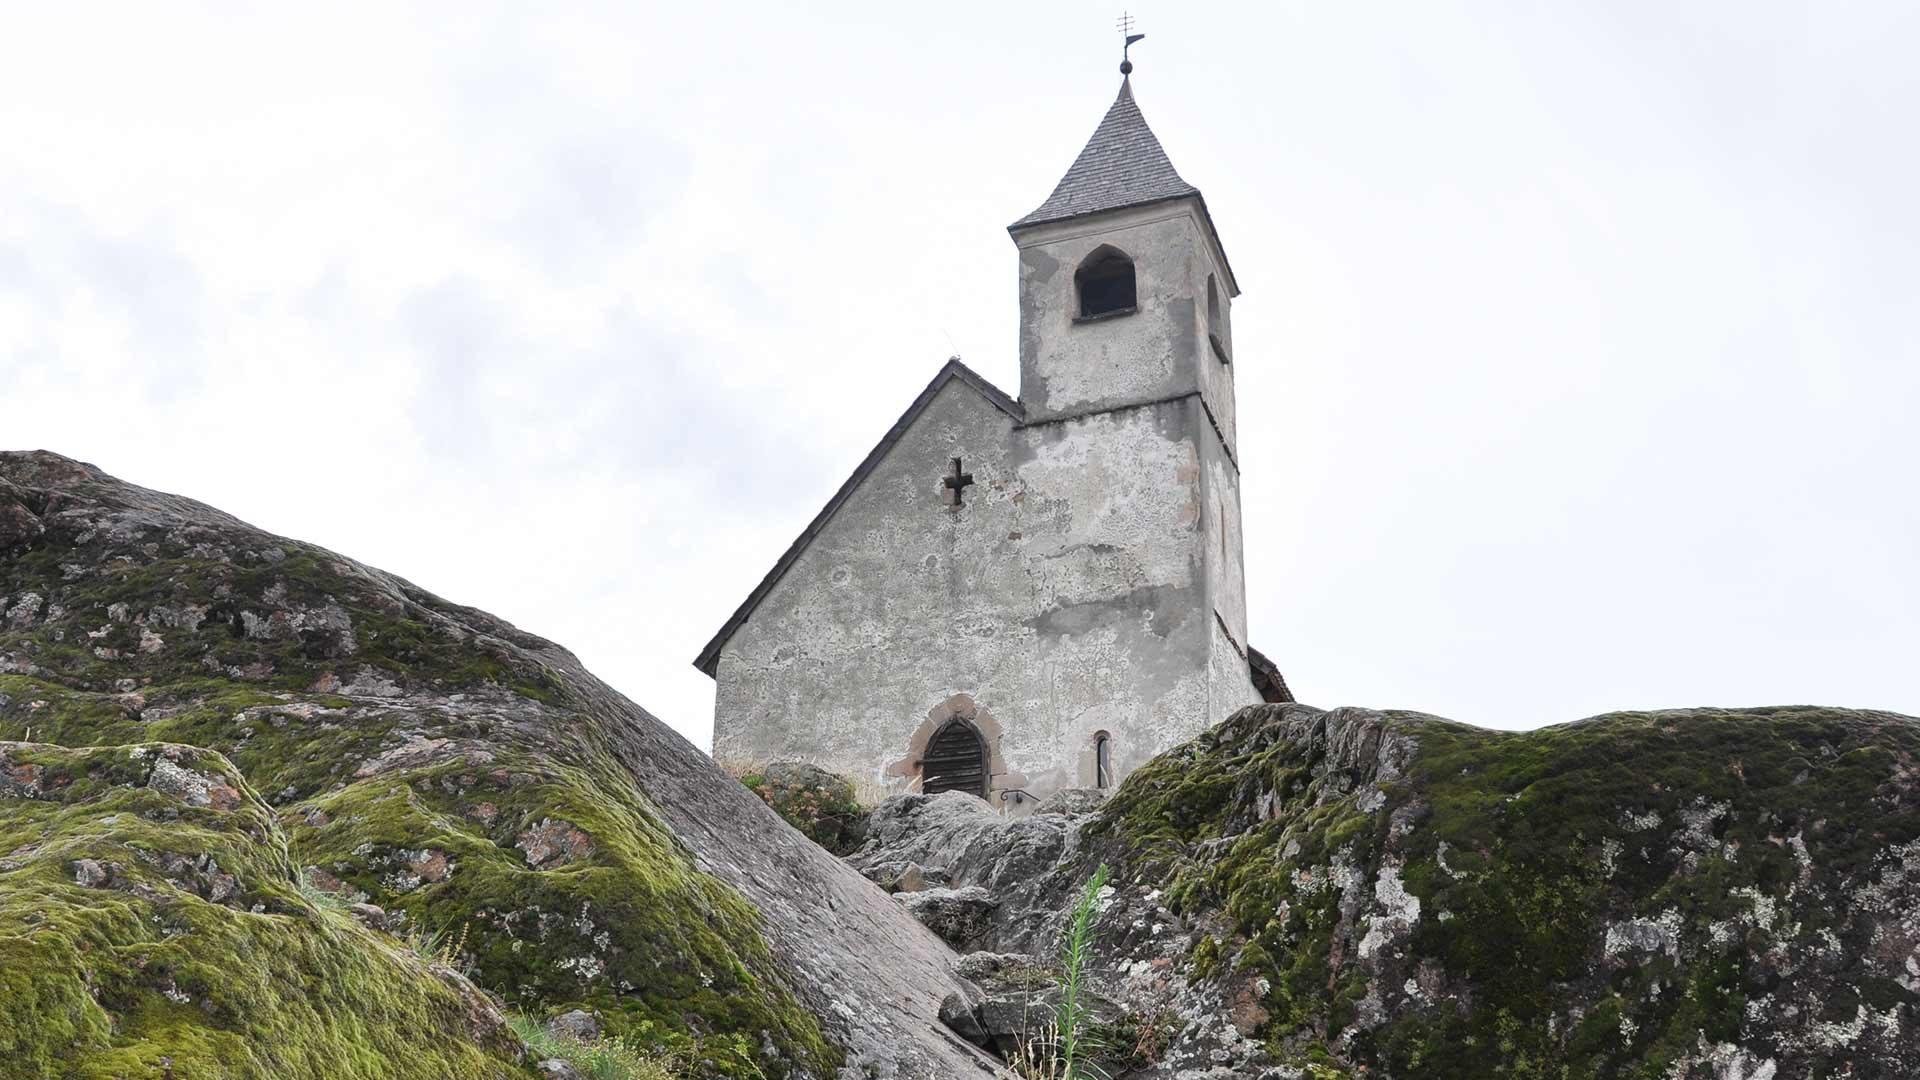 Chiesetta di S. Ippolito sopra San Leonardo